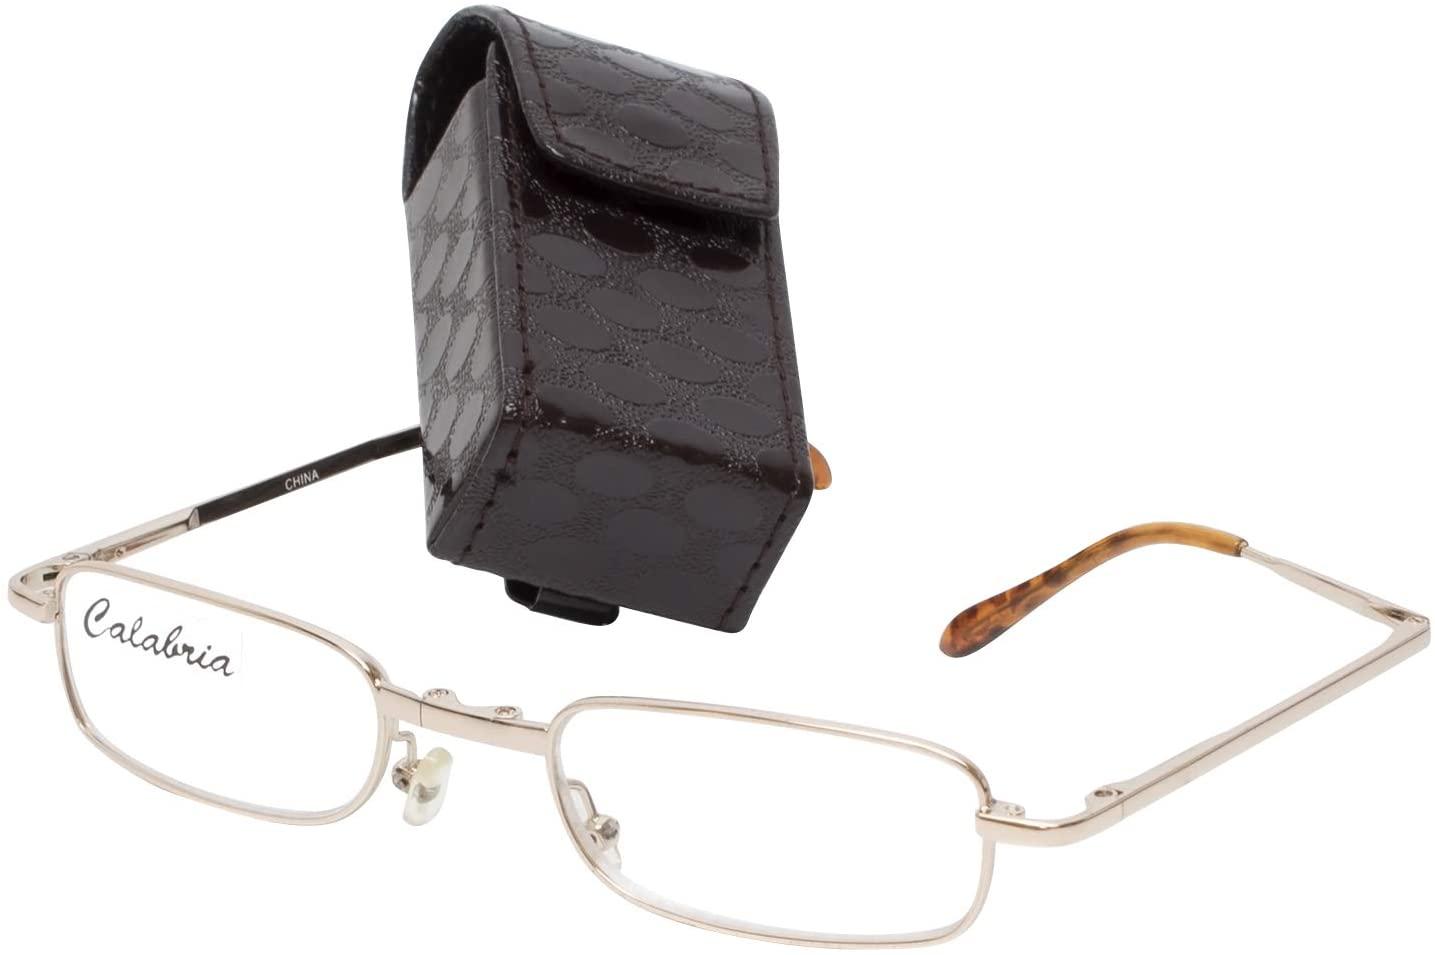 Calabria Folding Reading Glasses +1.75 power